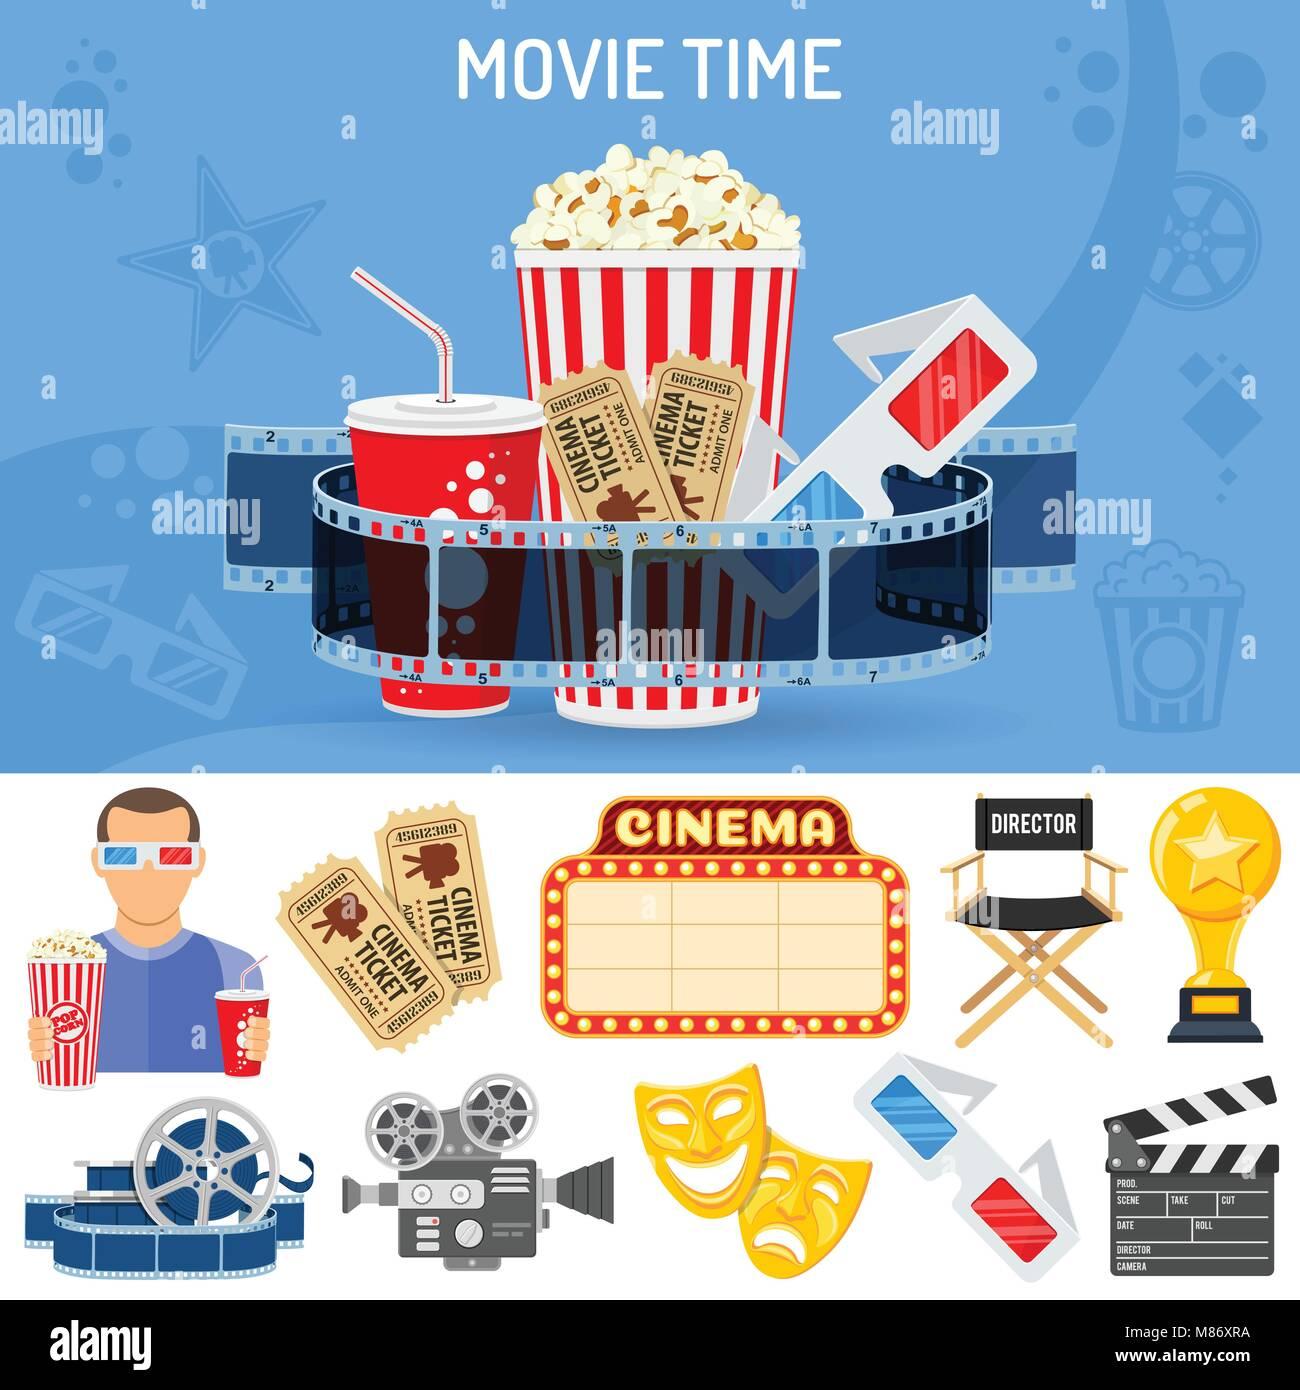 Cinema and Movie Concept - Stock Image